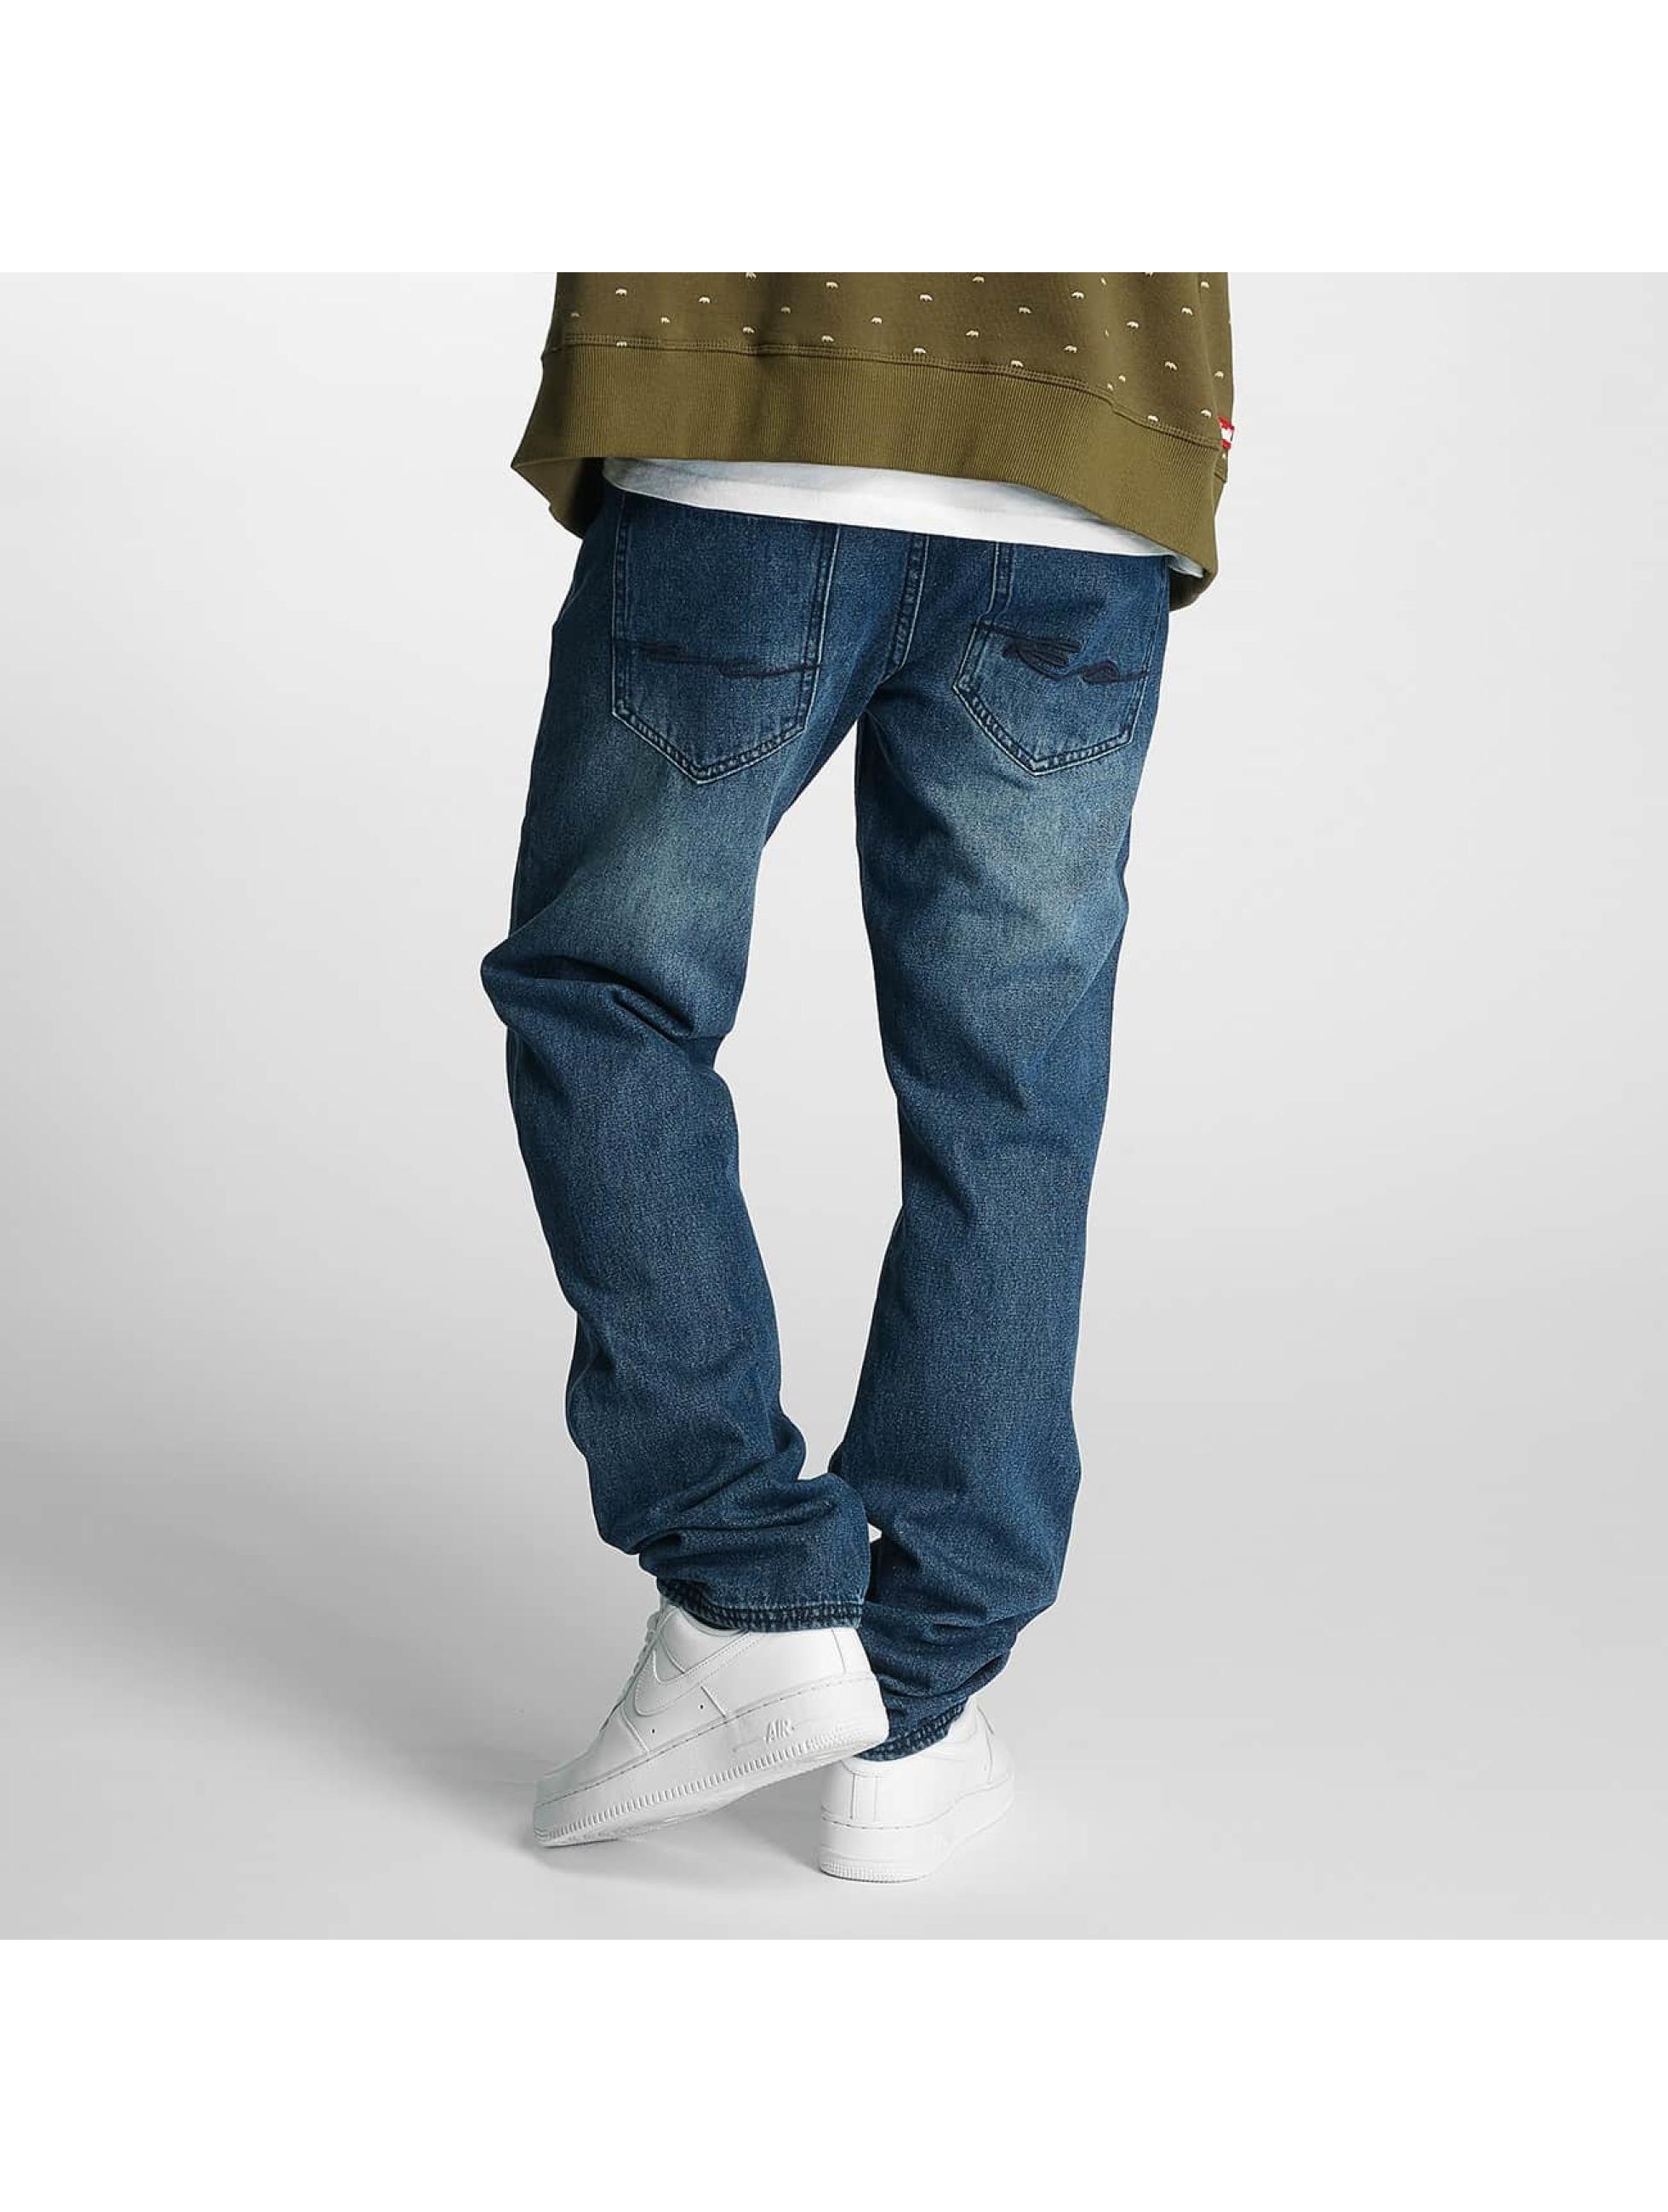 Ecko-Unltd-Uomini-Jeans-Jeans-larghi-Kamino